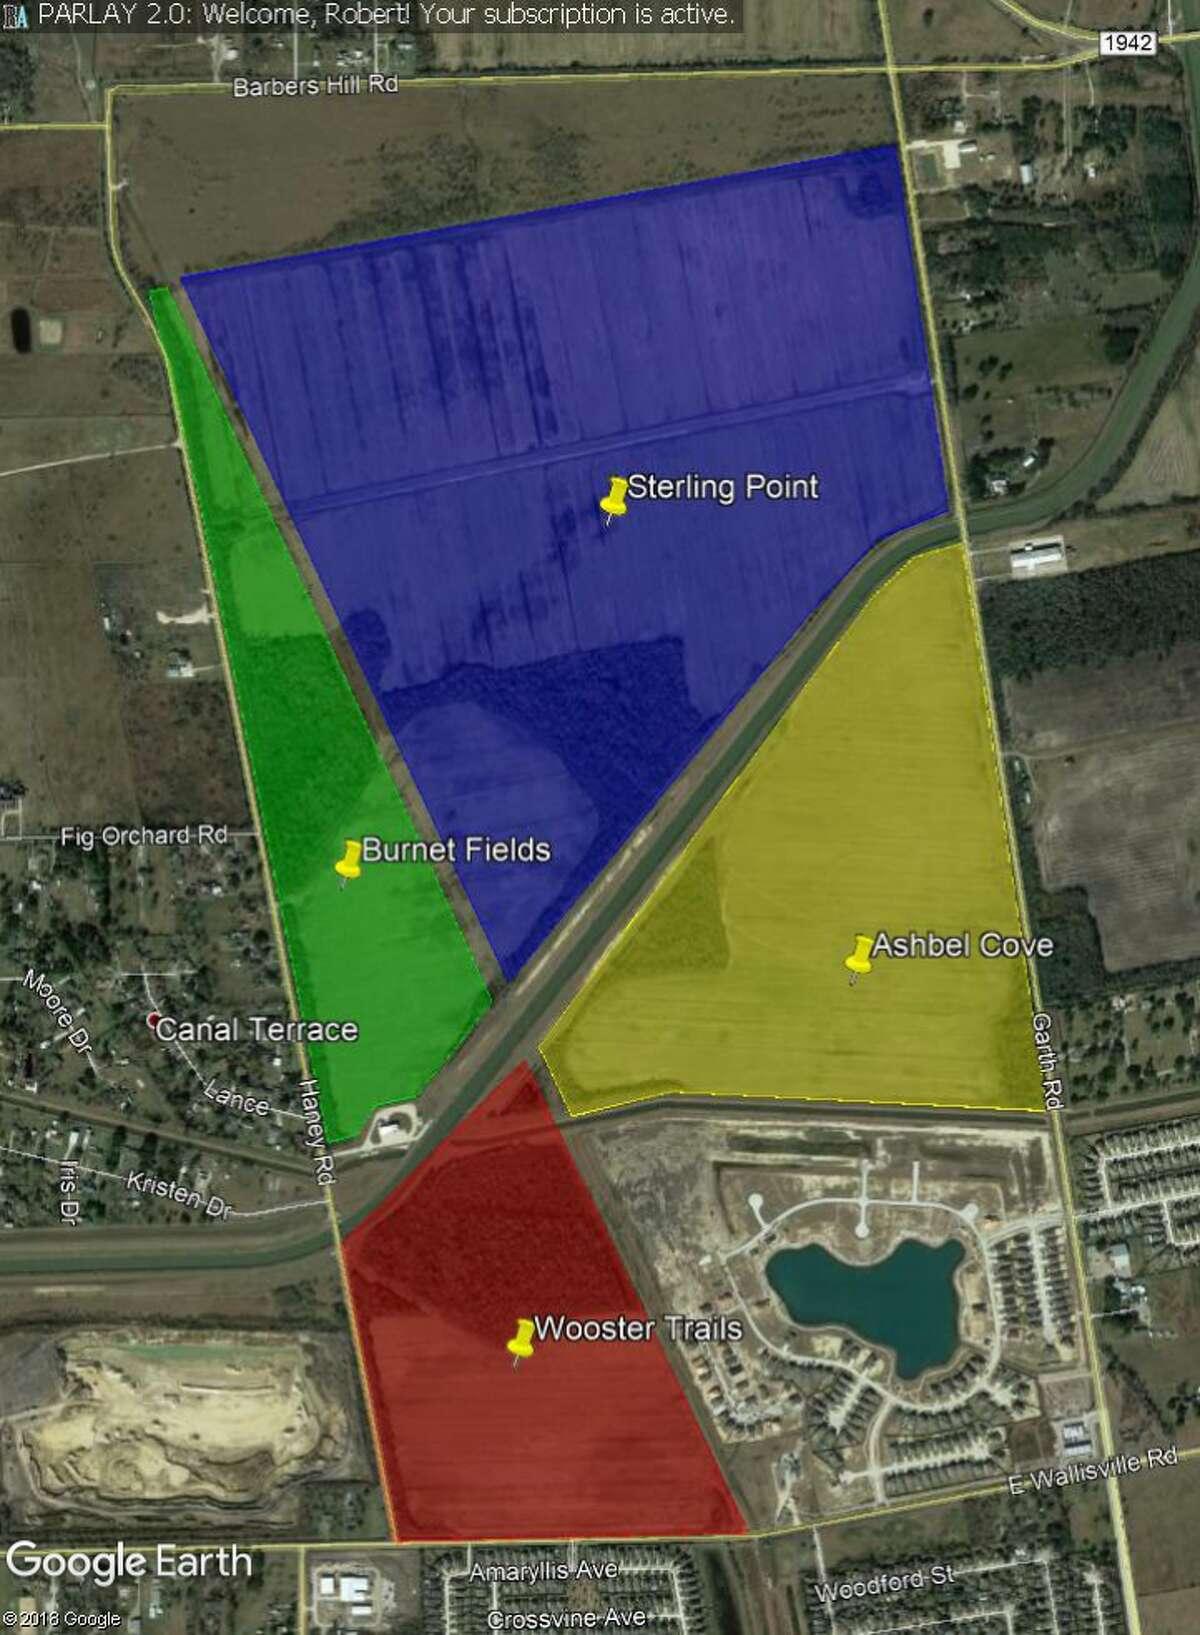 Baytown Crossings will consist of four neighborhoods near Garth and Wallisville roads.